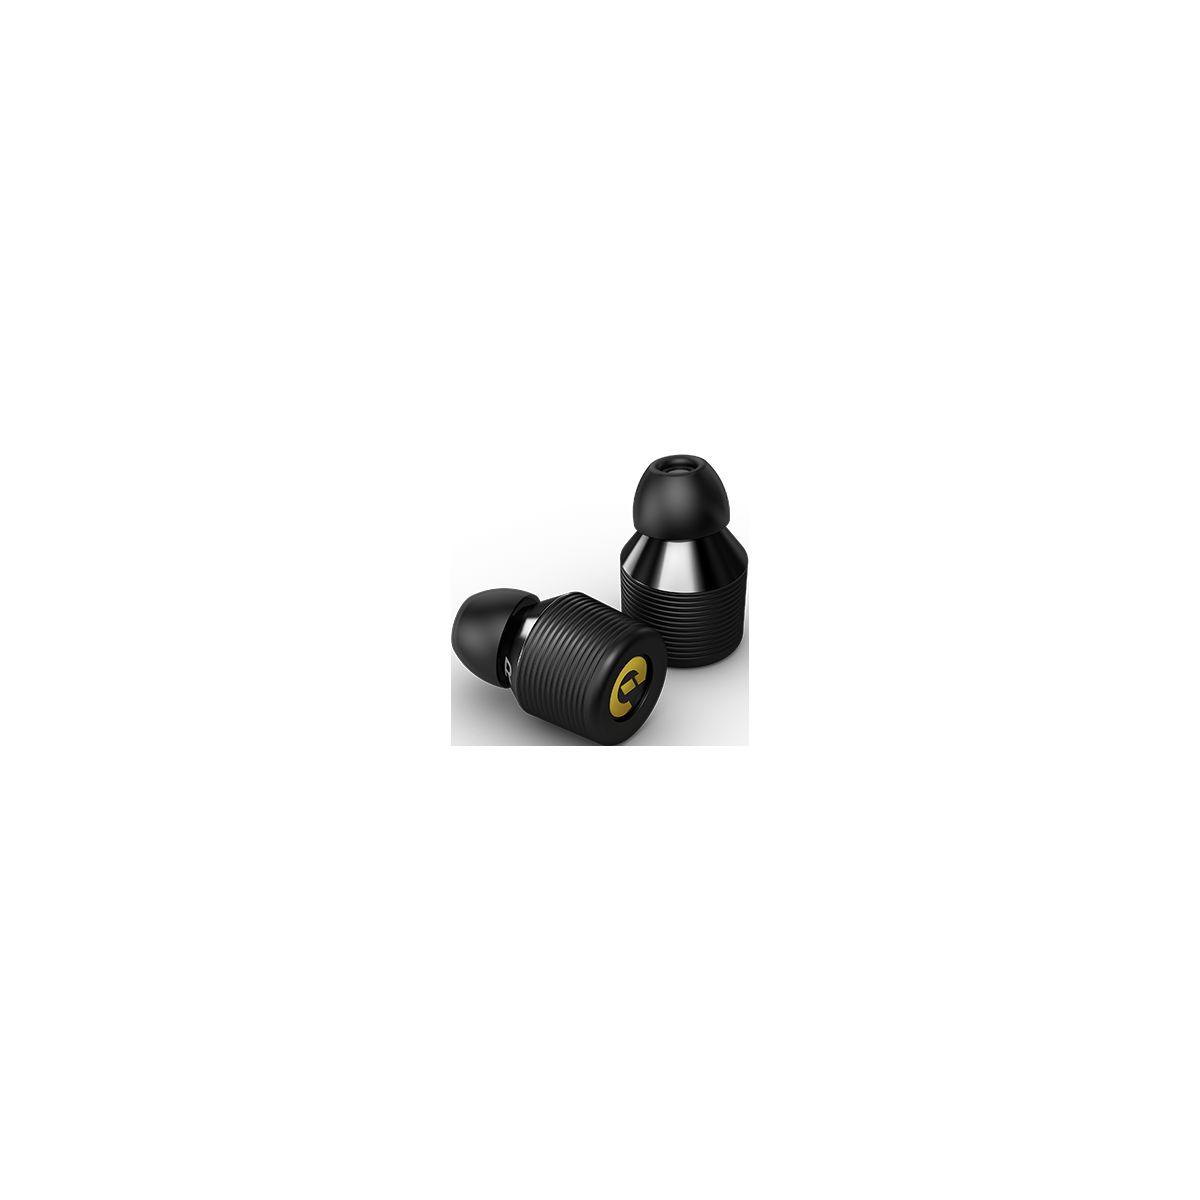 Ecouteurs intra EARIN Bluetooth Earbuds M-1 Alu